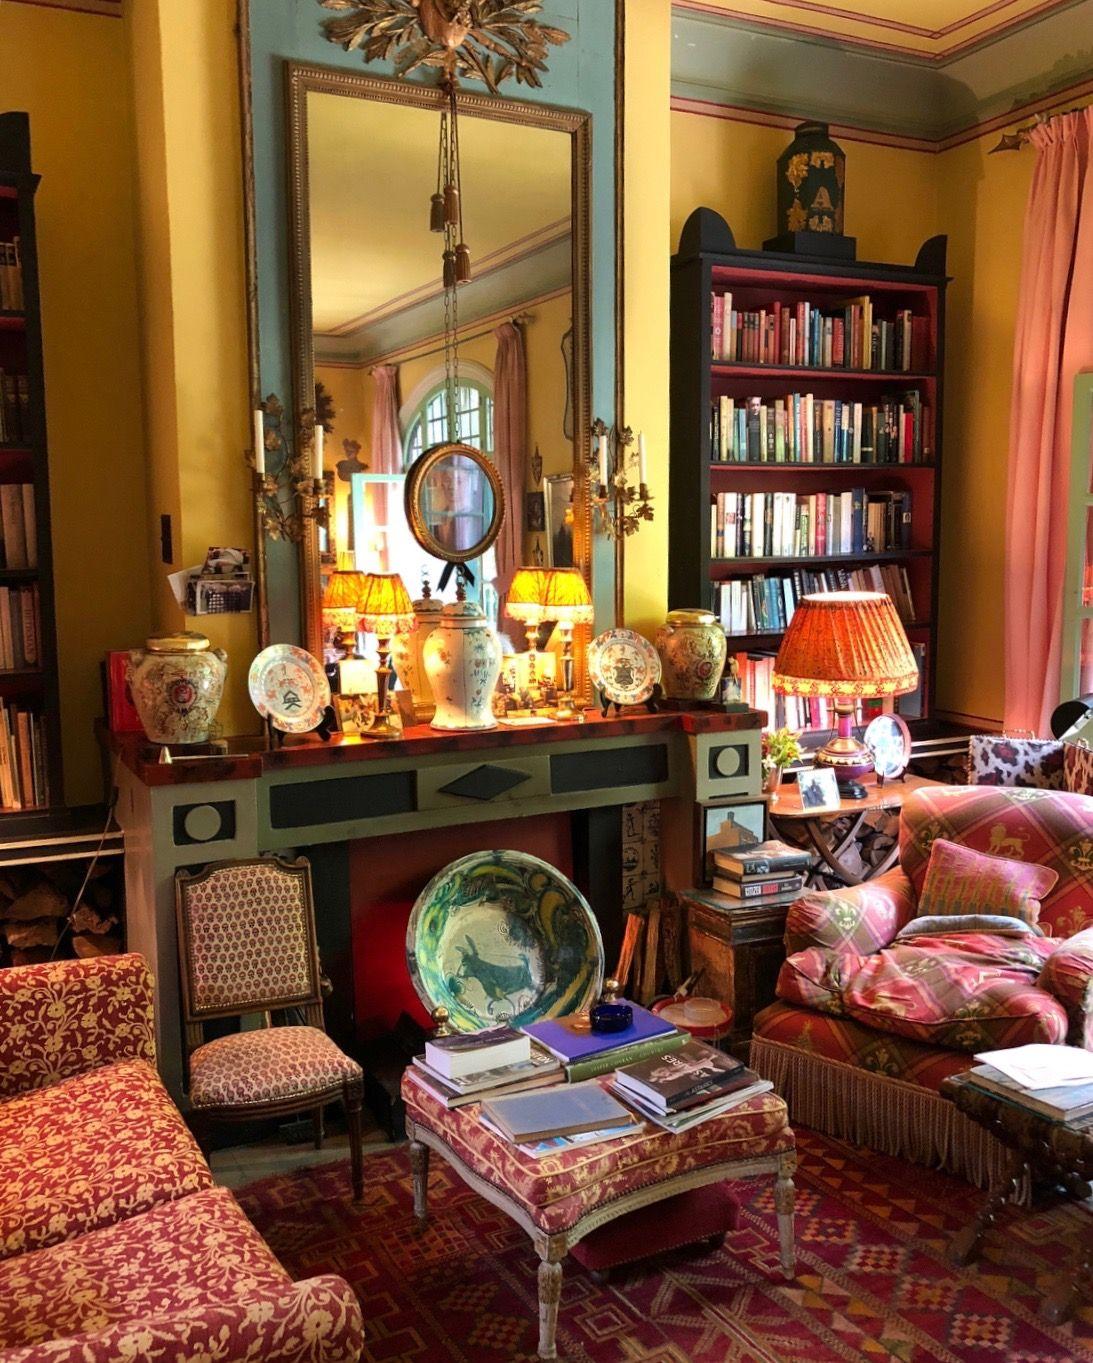 Stile E Interior Design Italiani A Londra: Regal Looking Sitting Room.